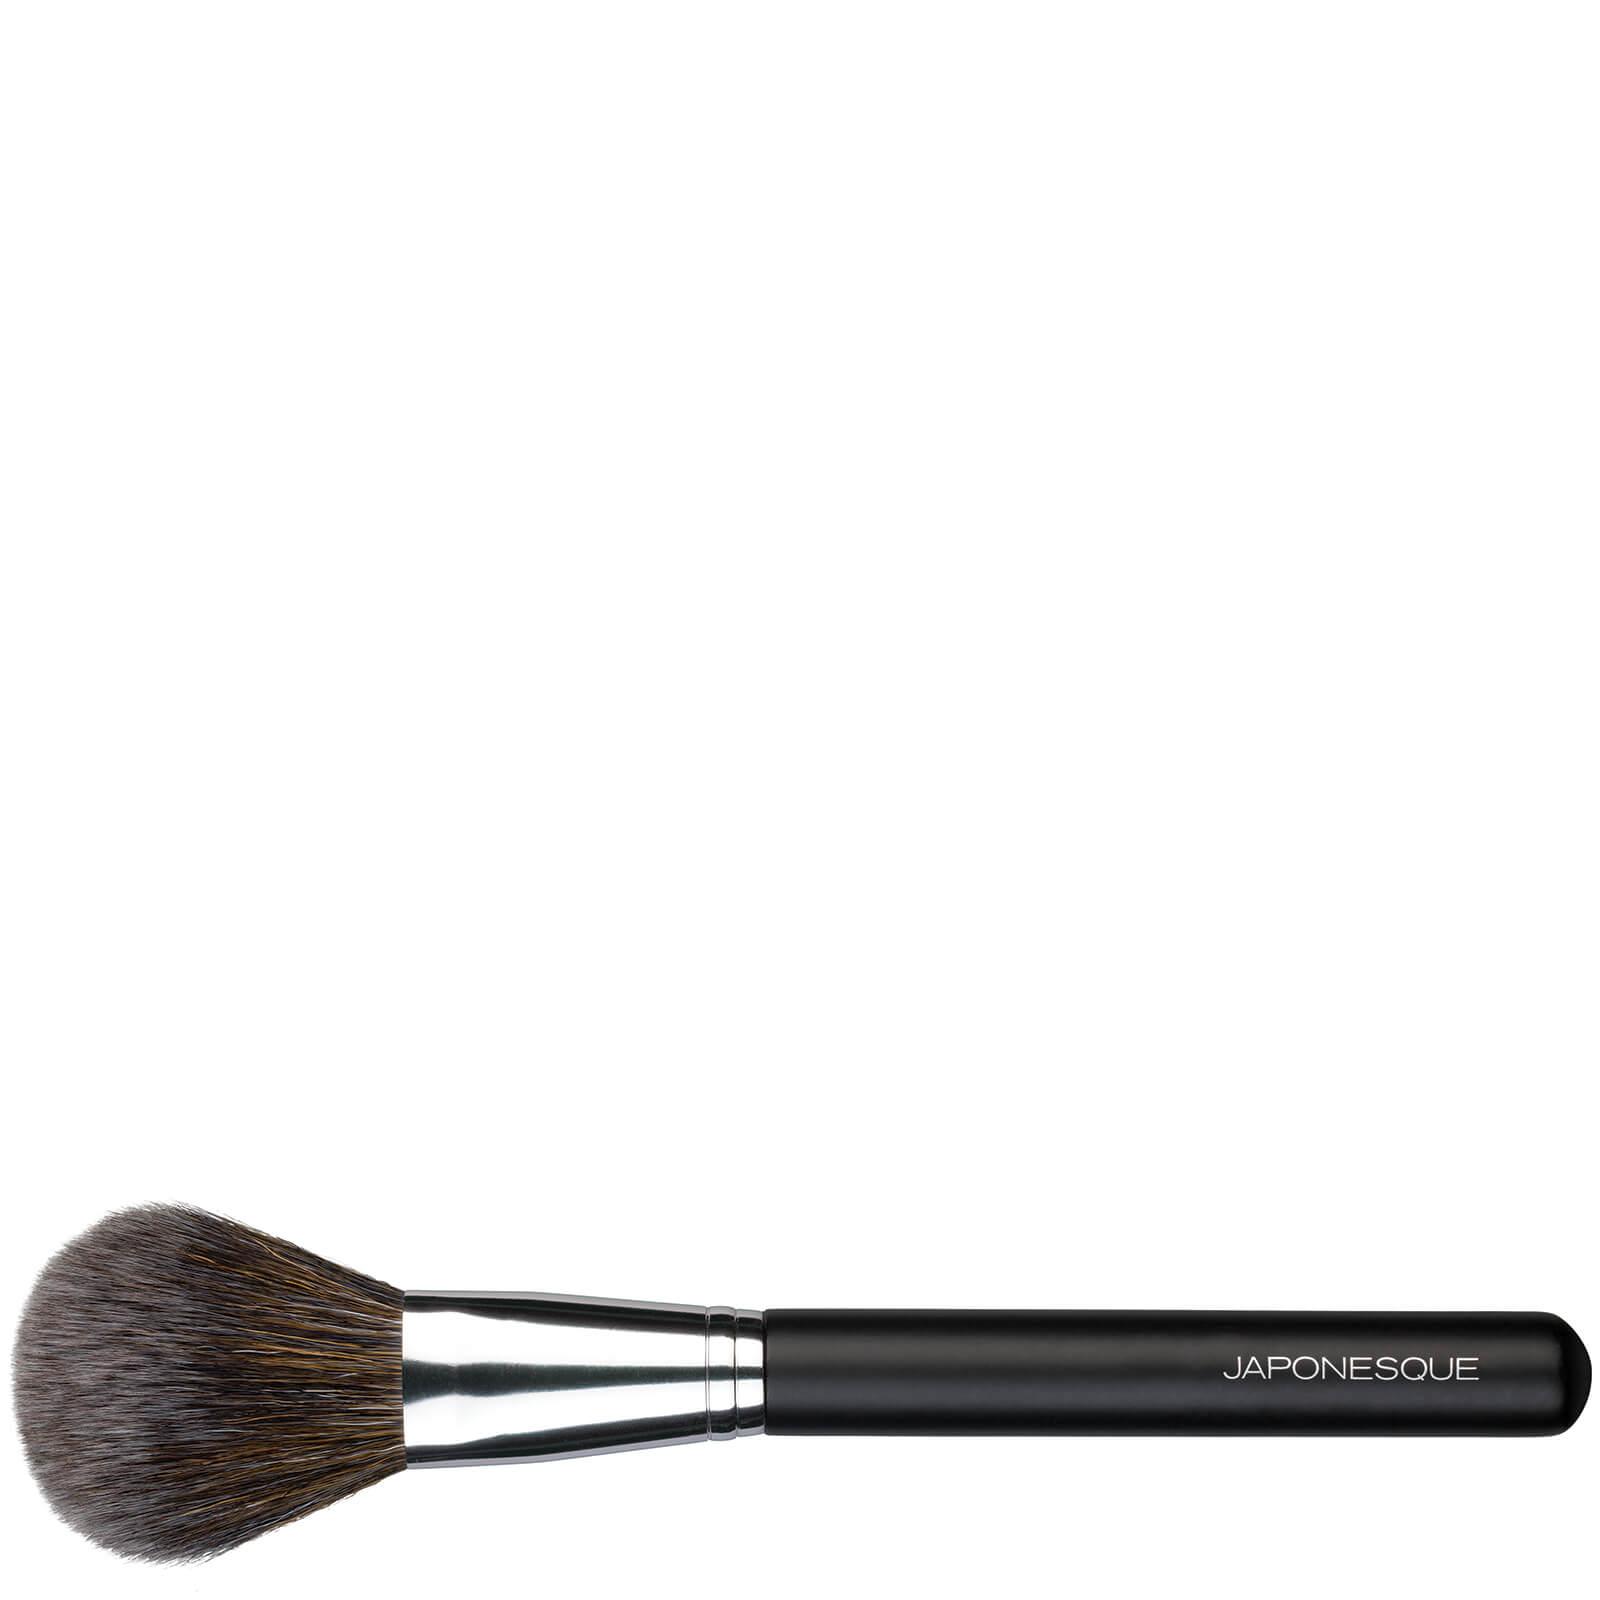 Slanted Powder Brush by japonesque #12